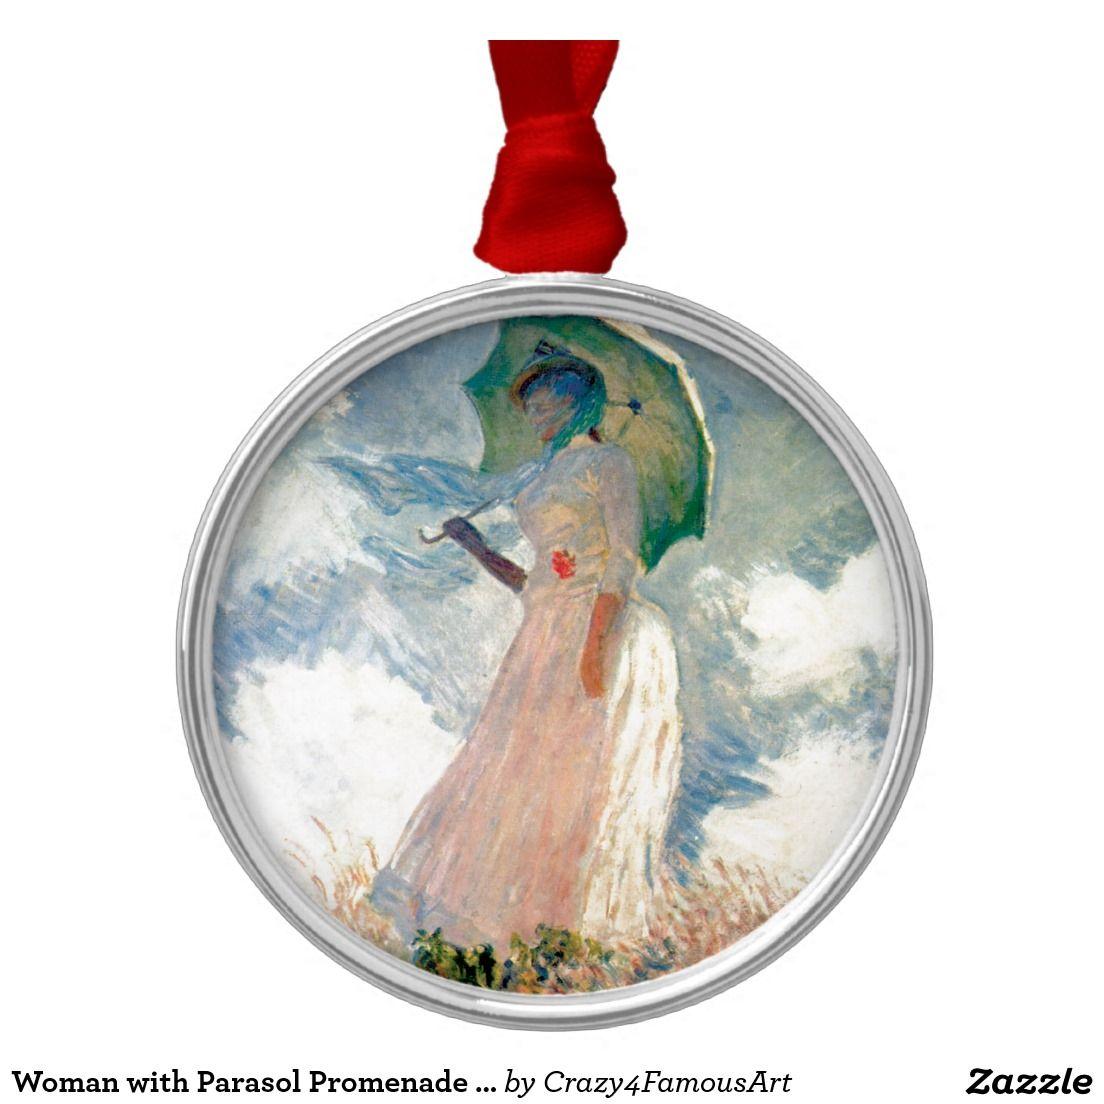 Woman with Parasol Promenade Monet